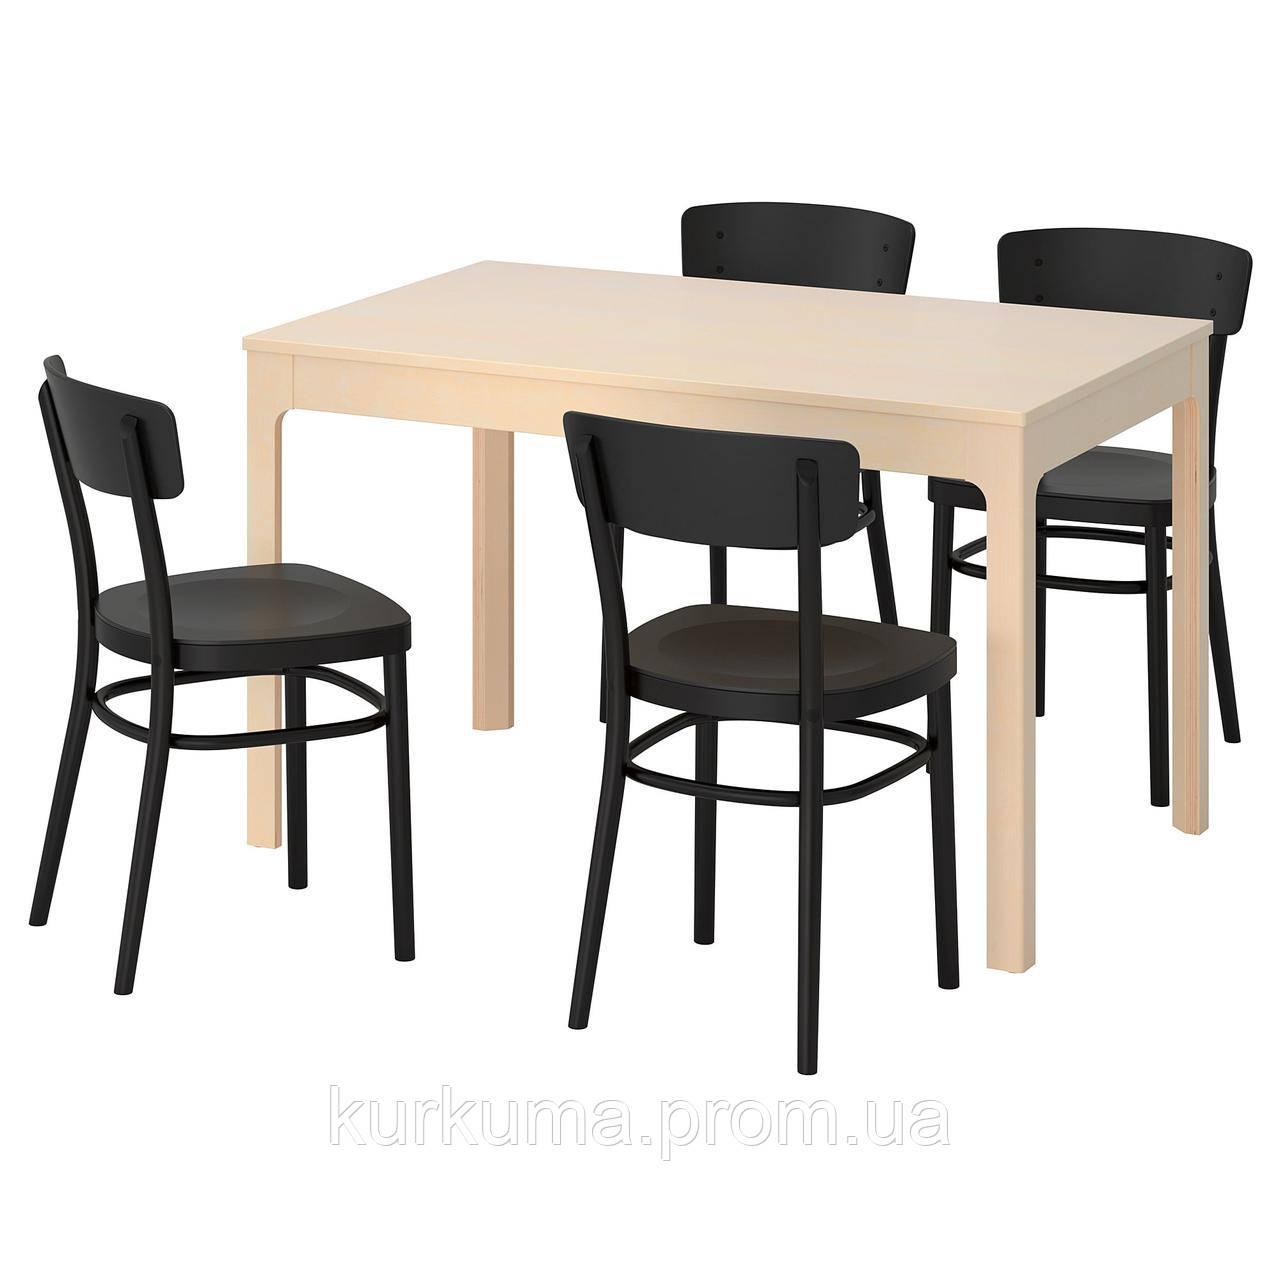 IKEA EKEDALEN/IDOLF Стол и 4 стула, береза, черная  (192.298.37)